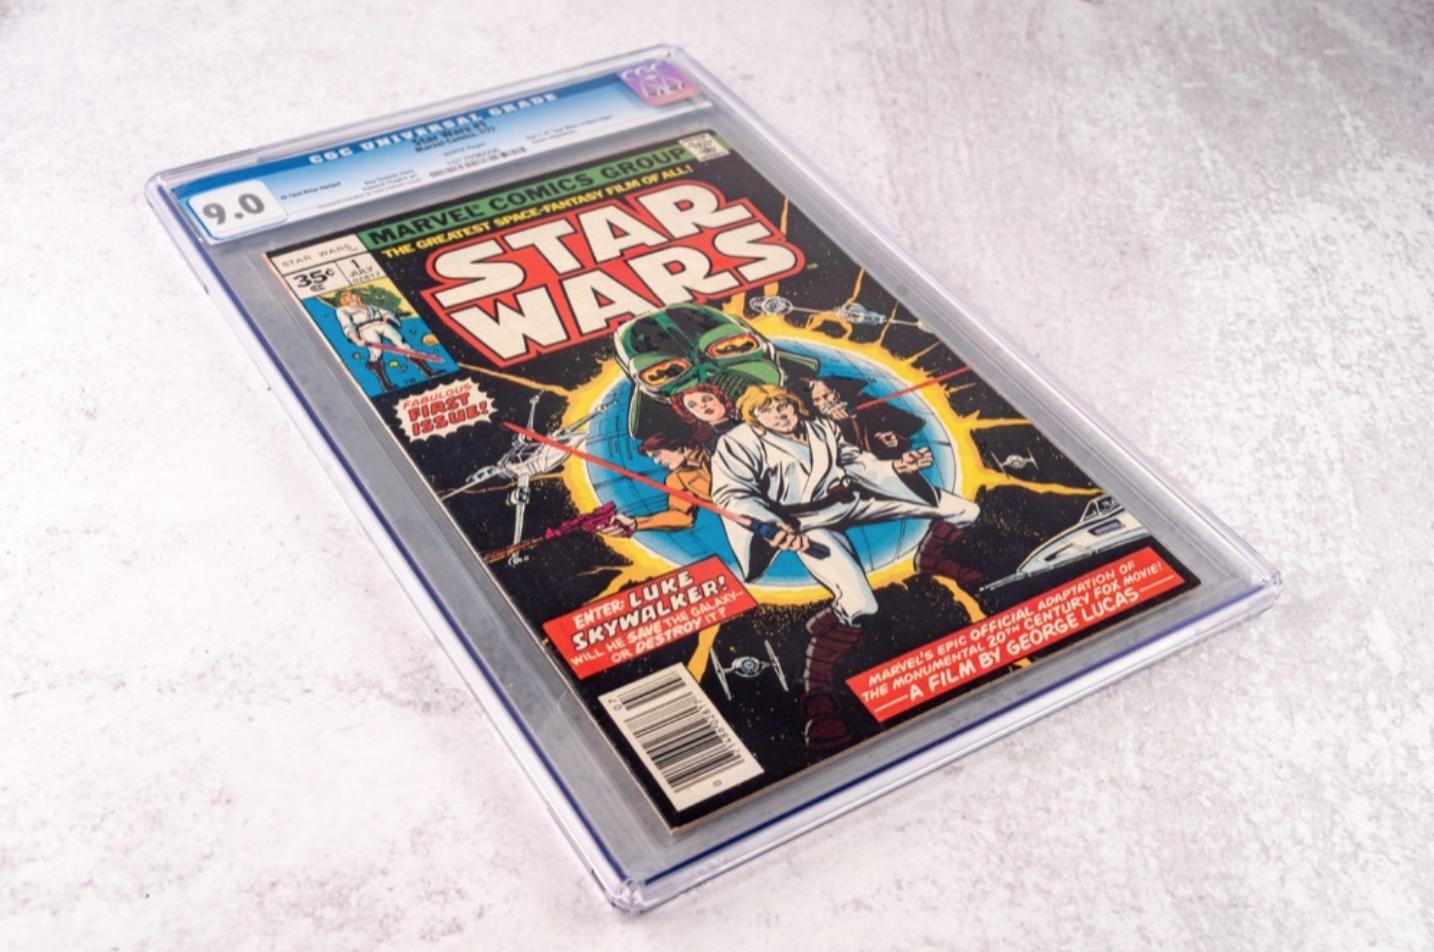 Marvel Star Wars #1 (CGC 9.0)